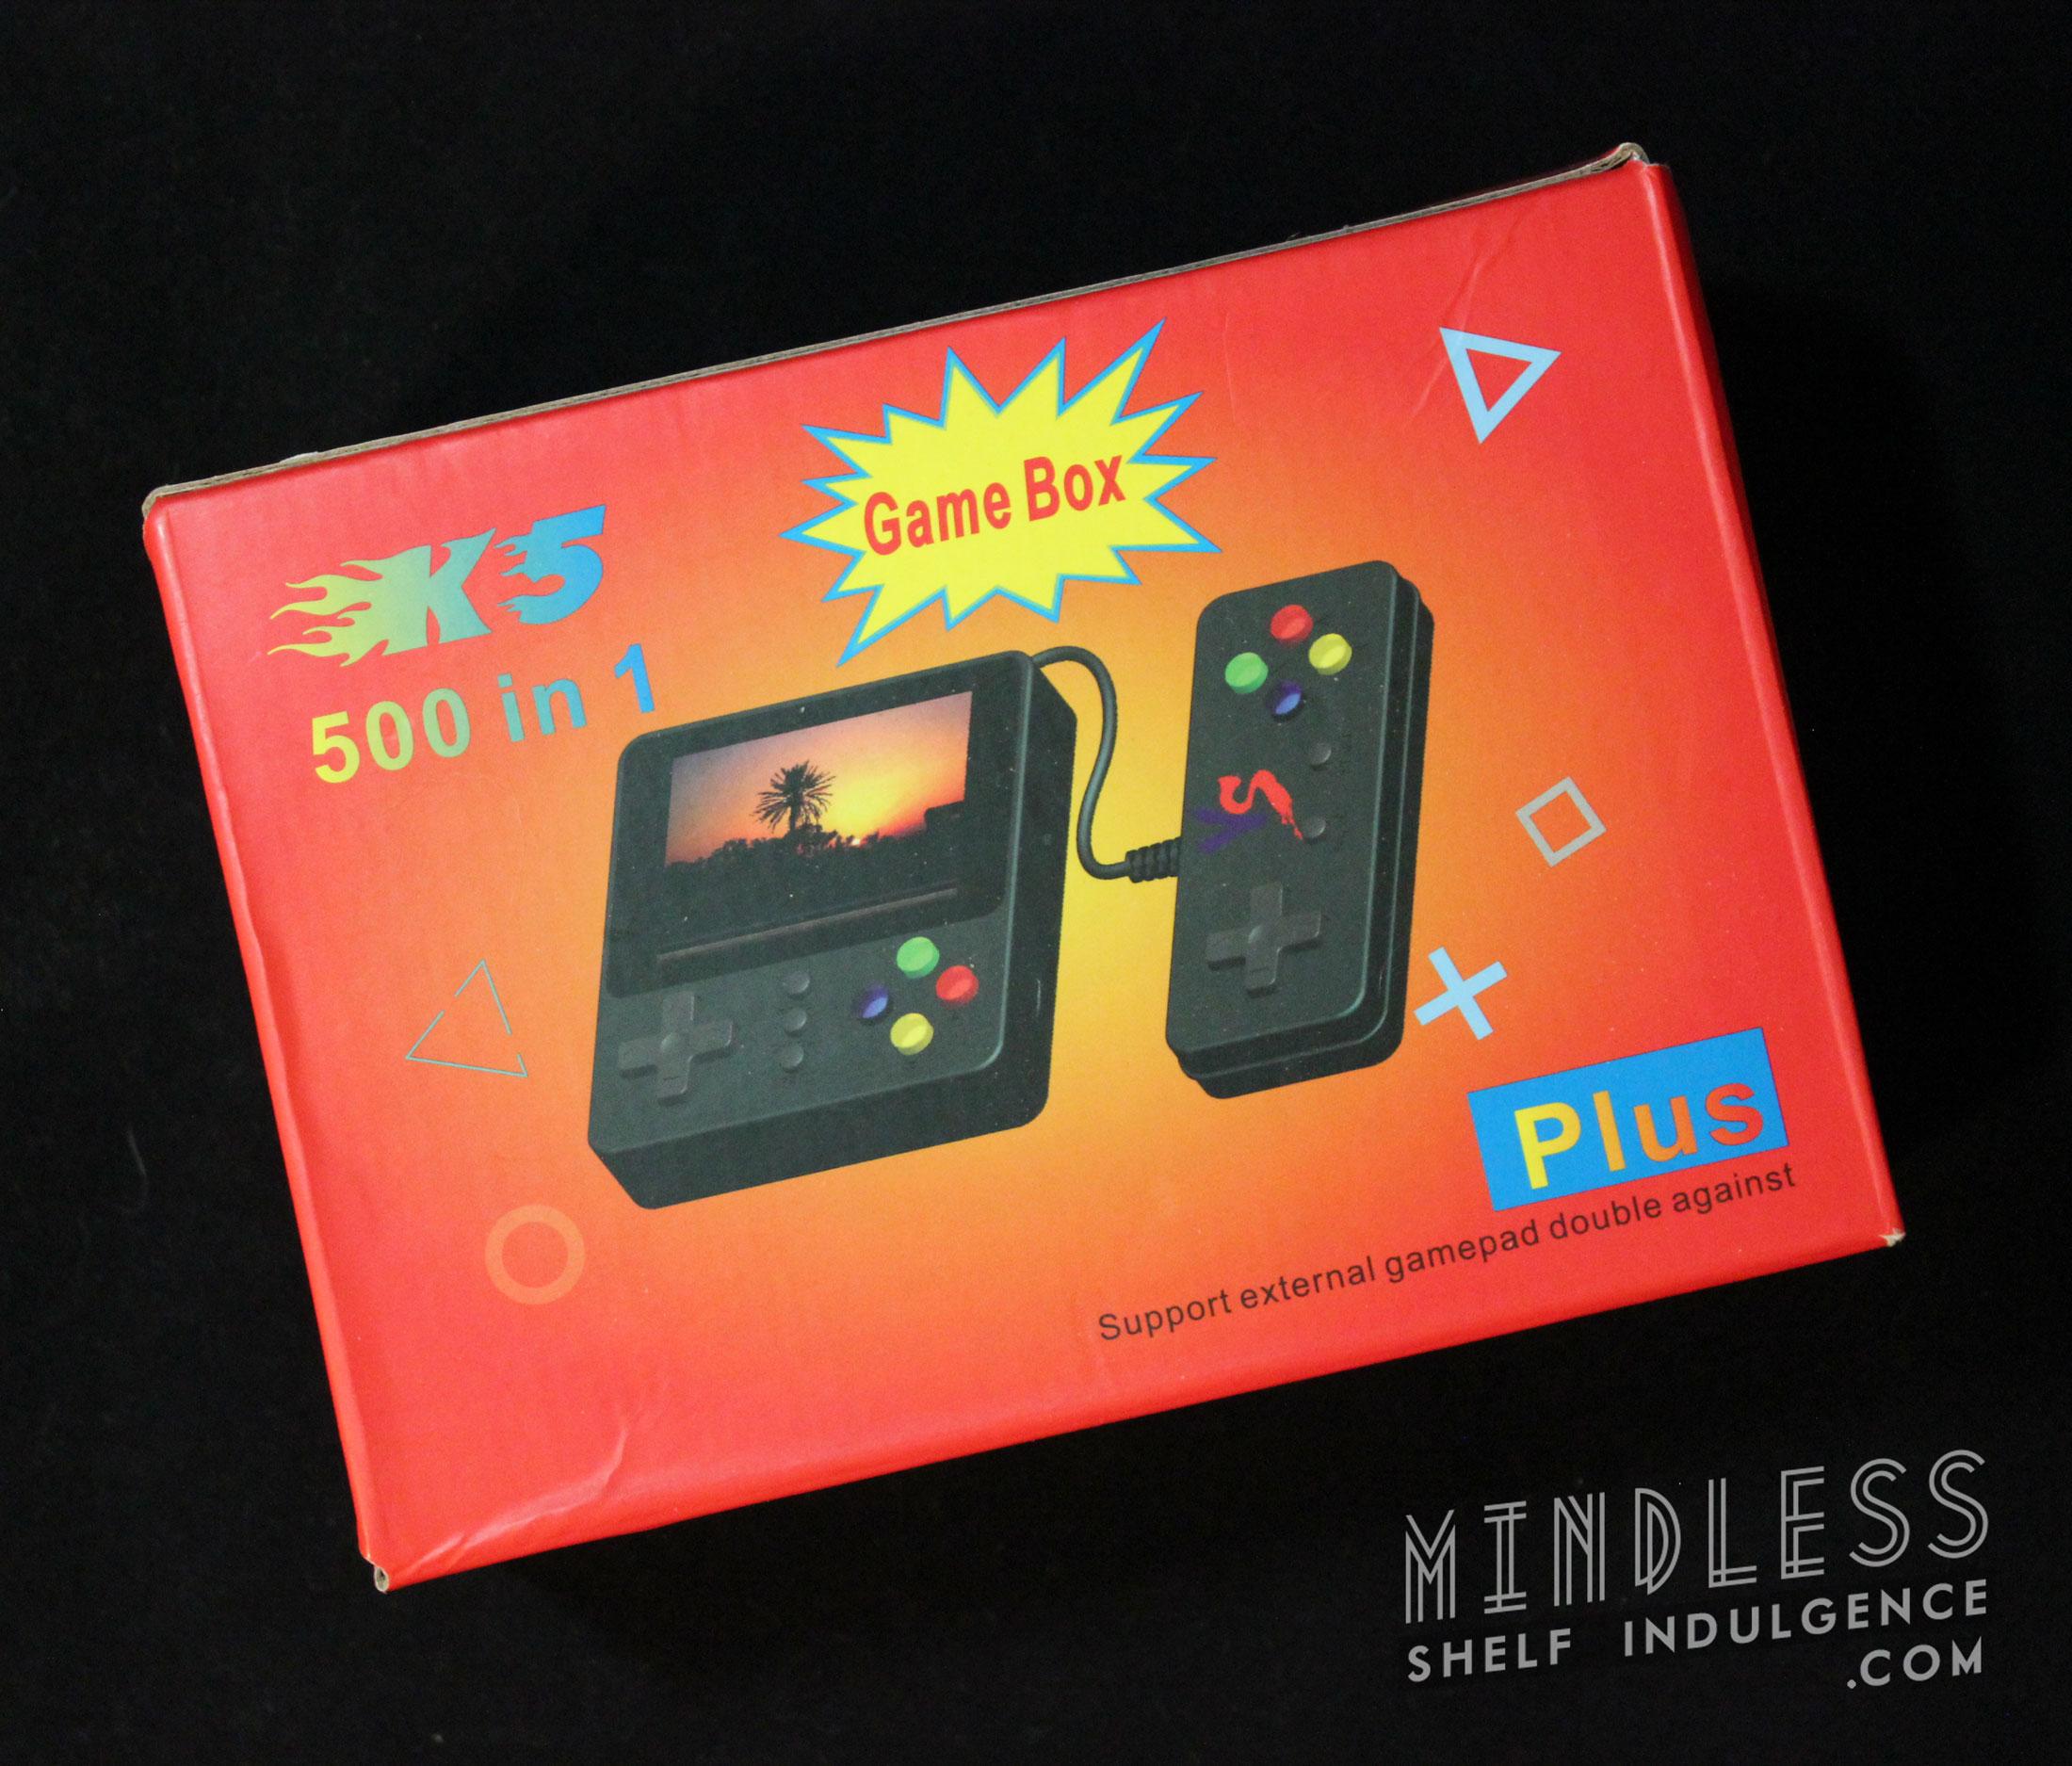 K5 Retro Video Game System